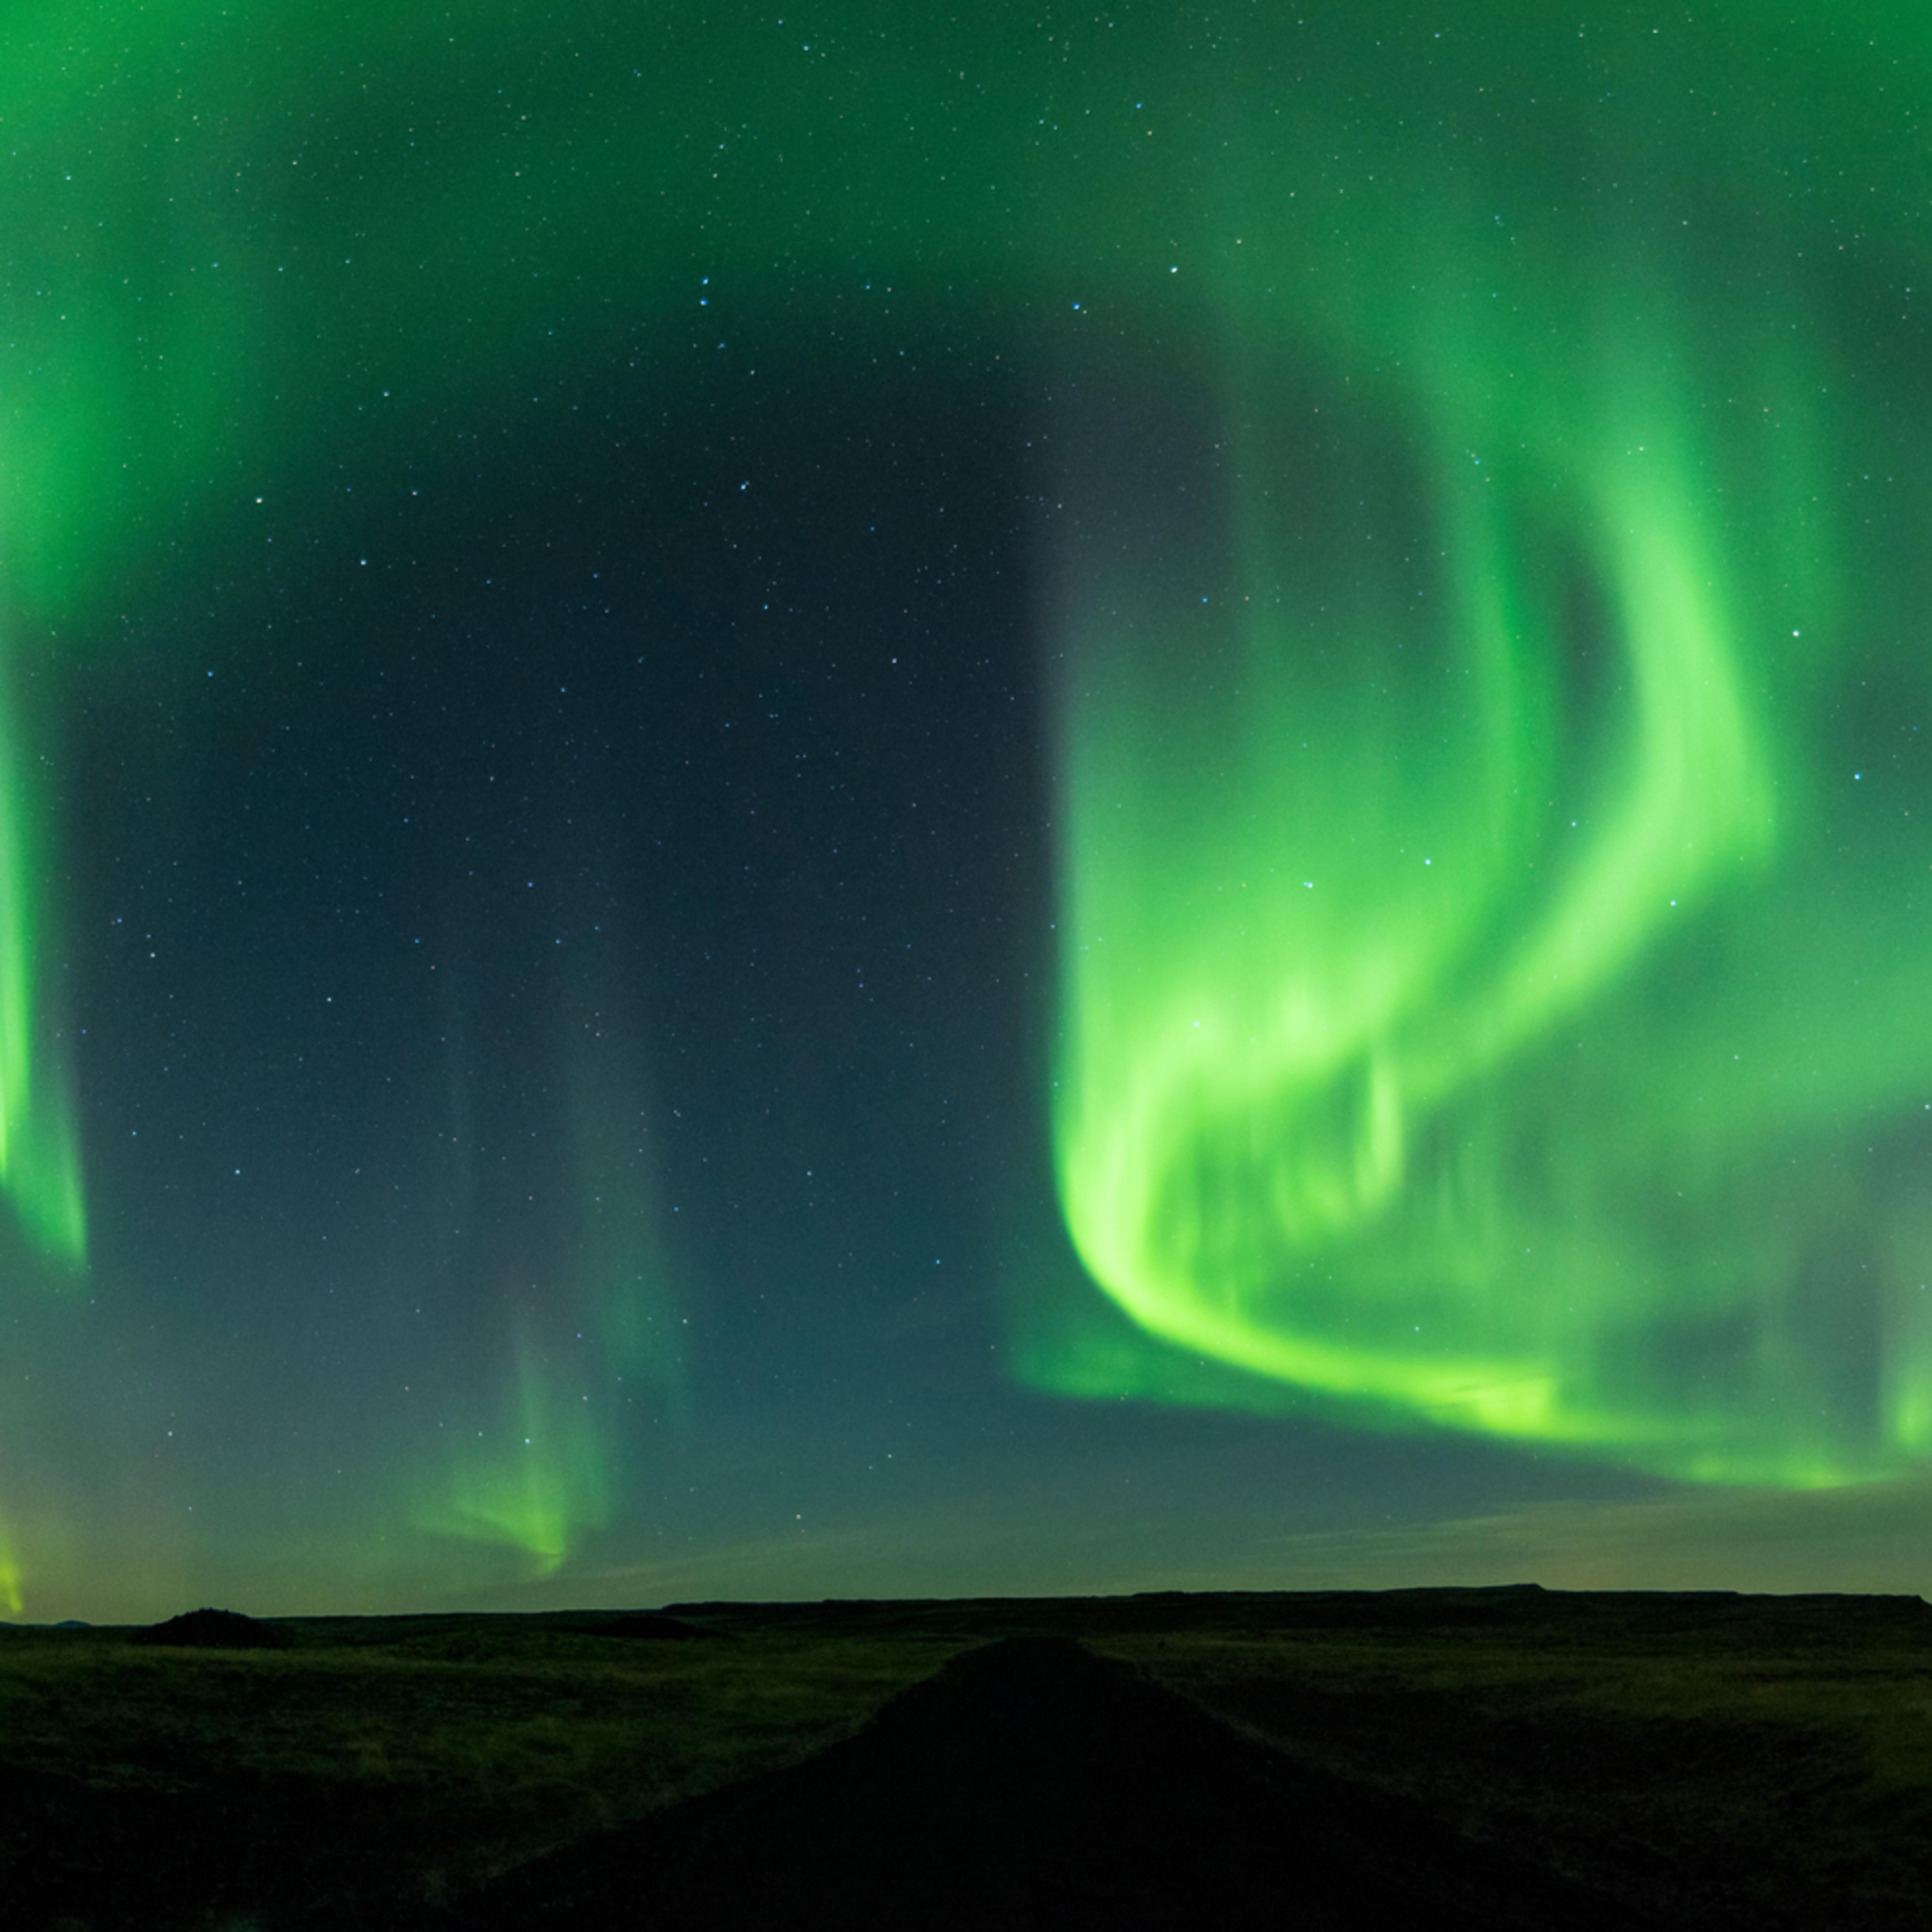 Northern lights south iceland nwlkot